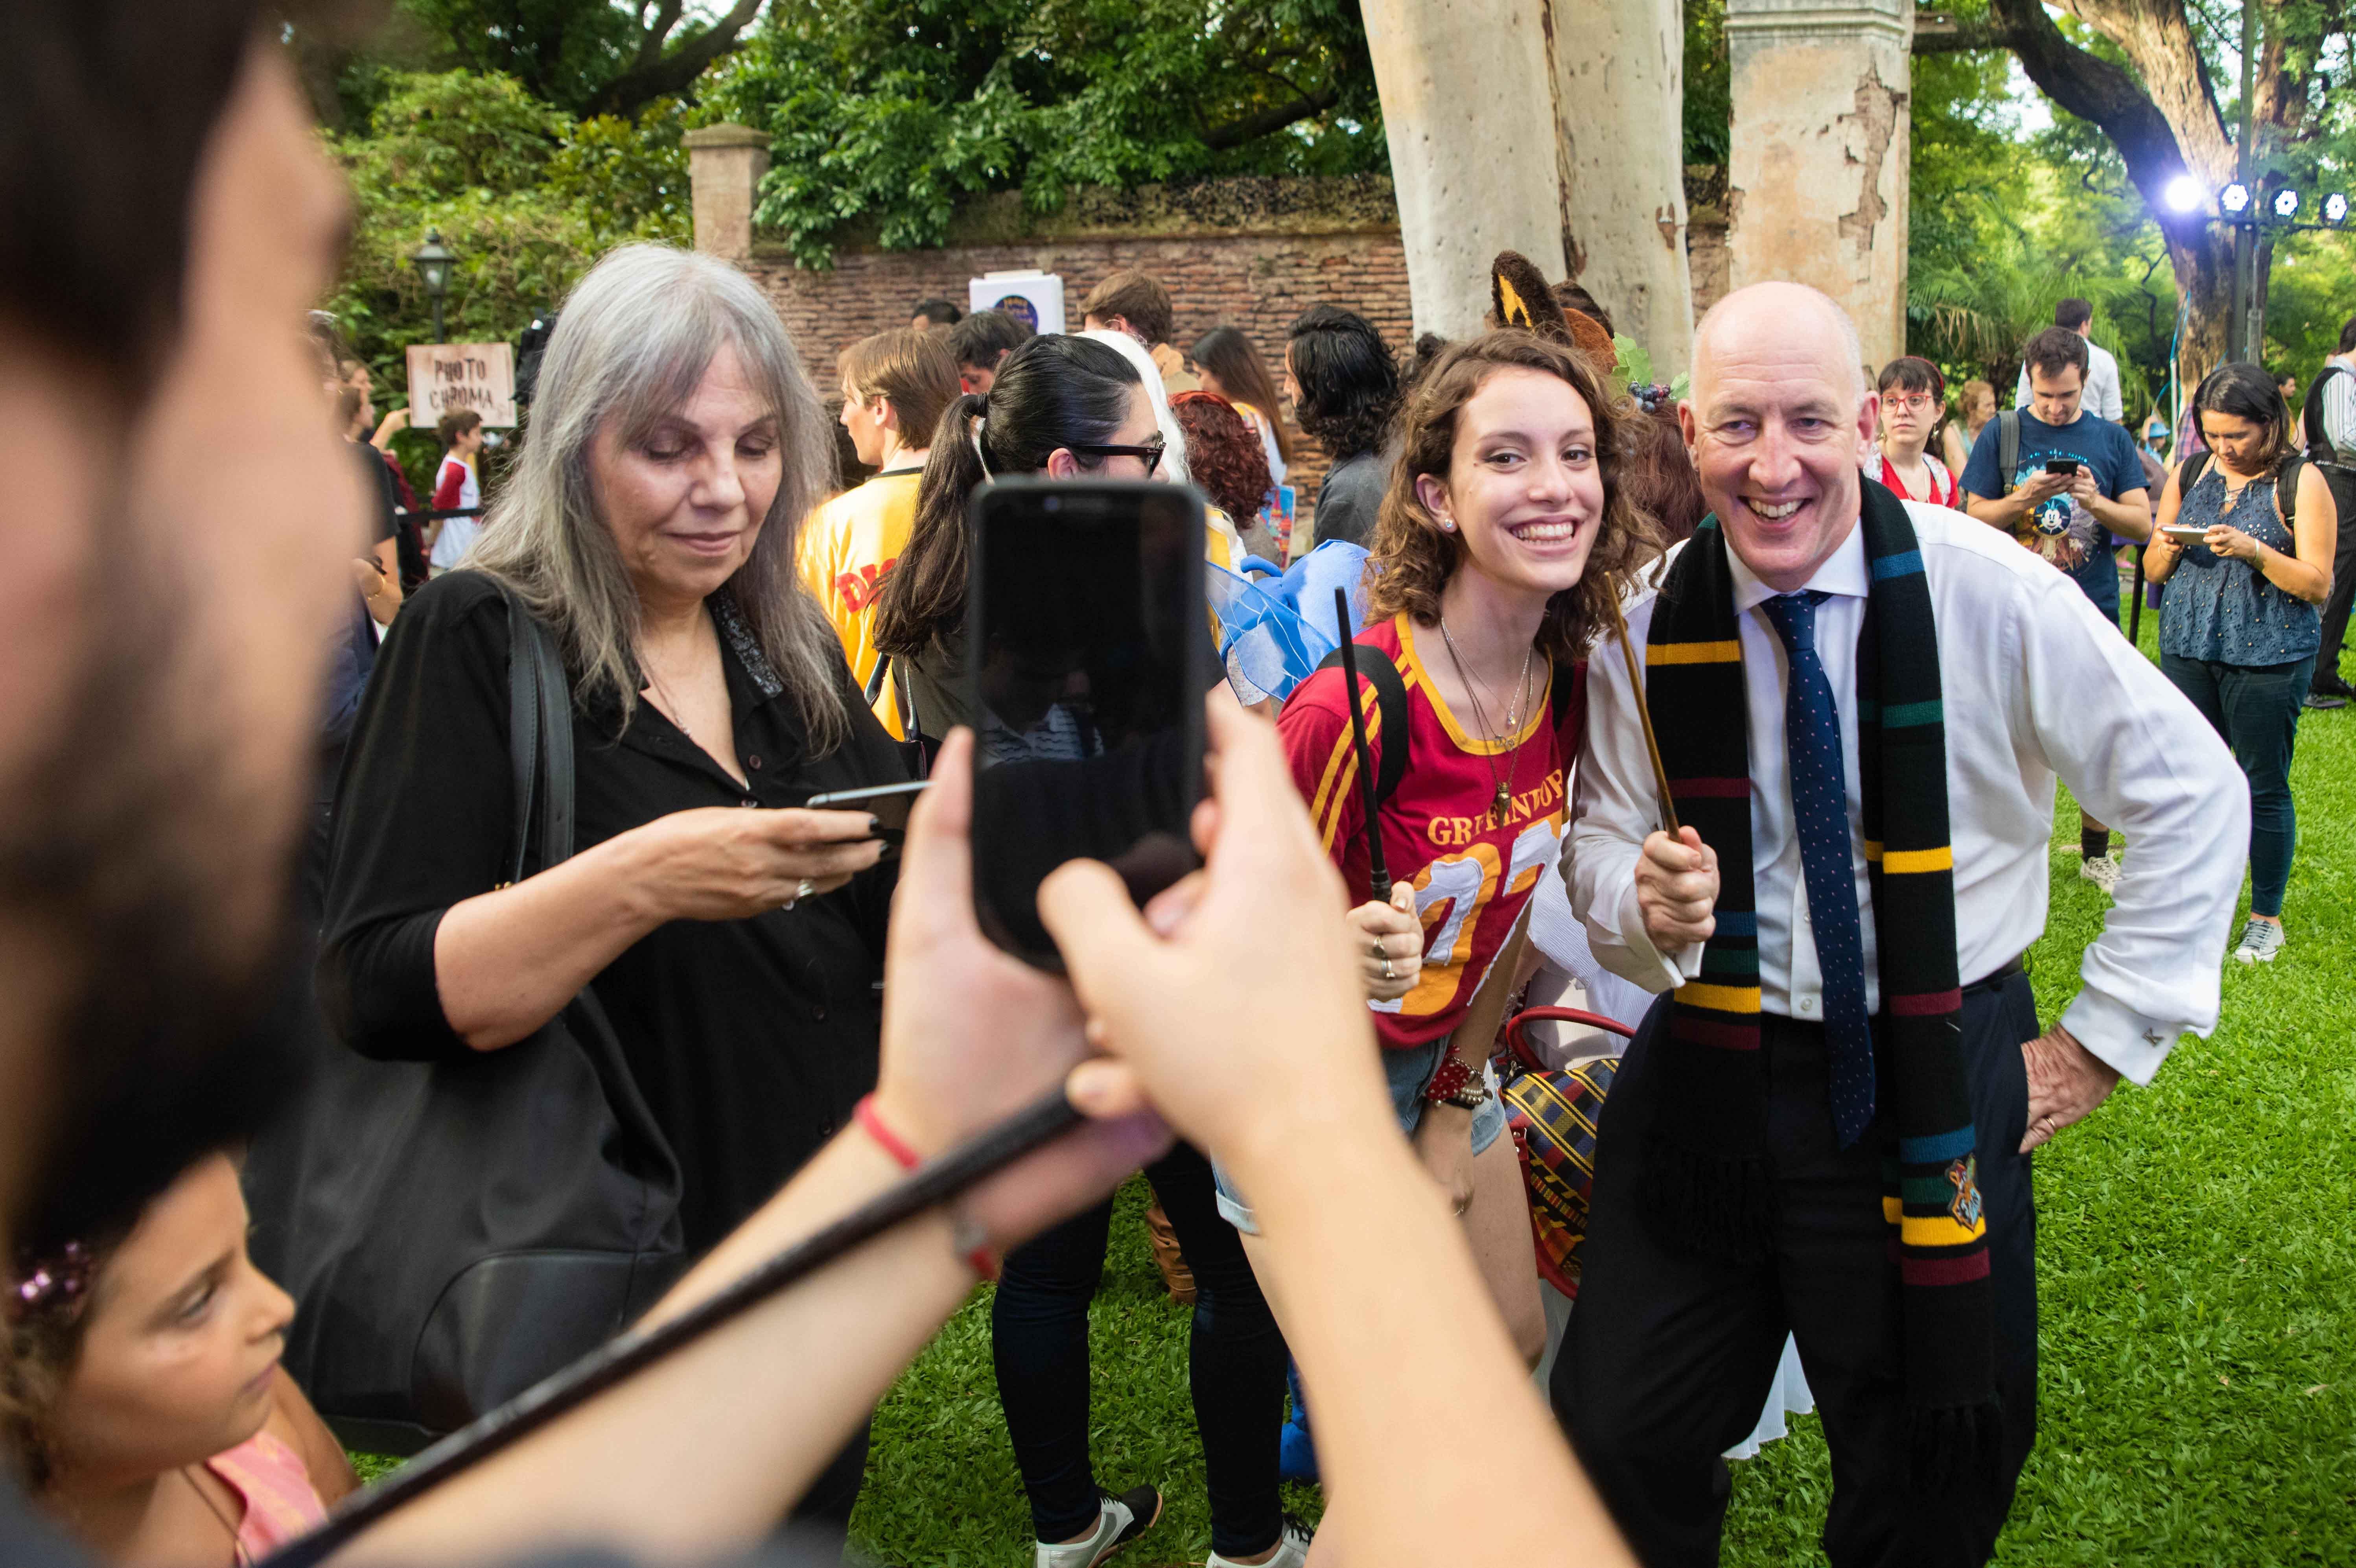 El embajador británico en la Argentina, Mark Kent, participó de la jornada